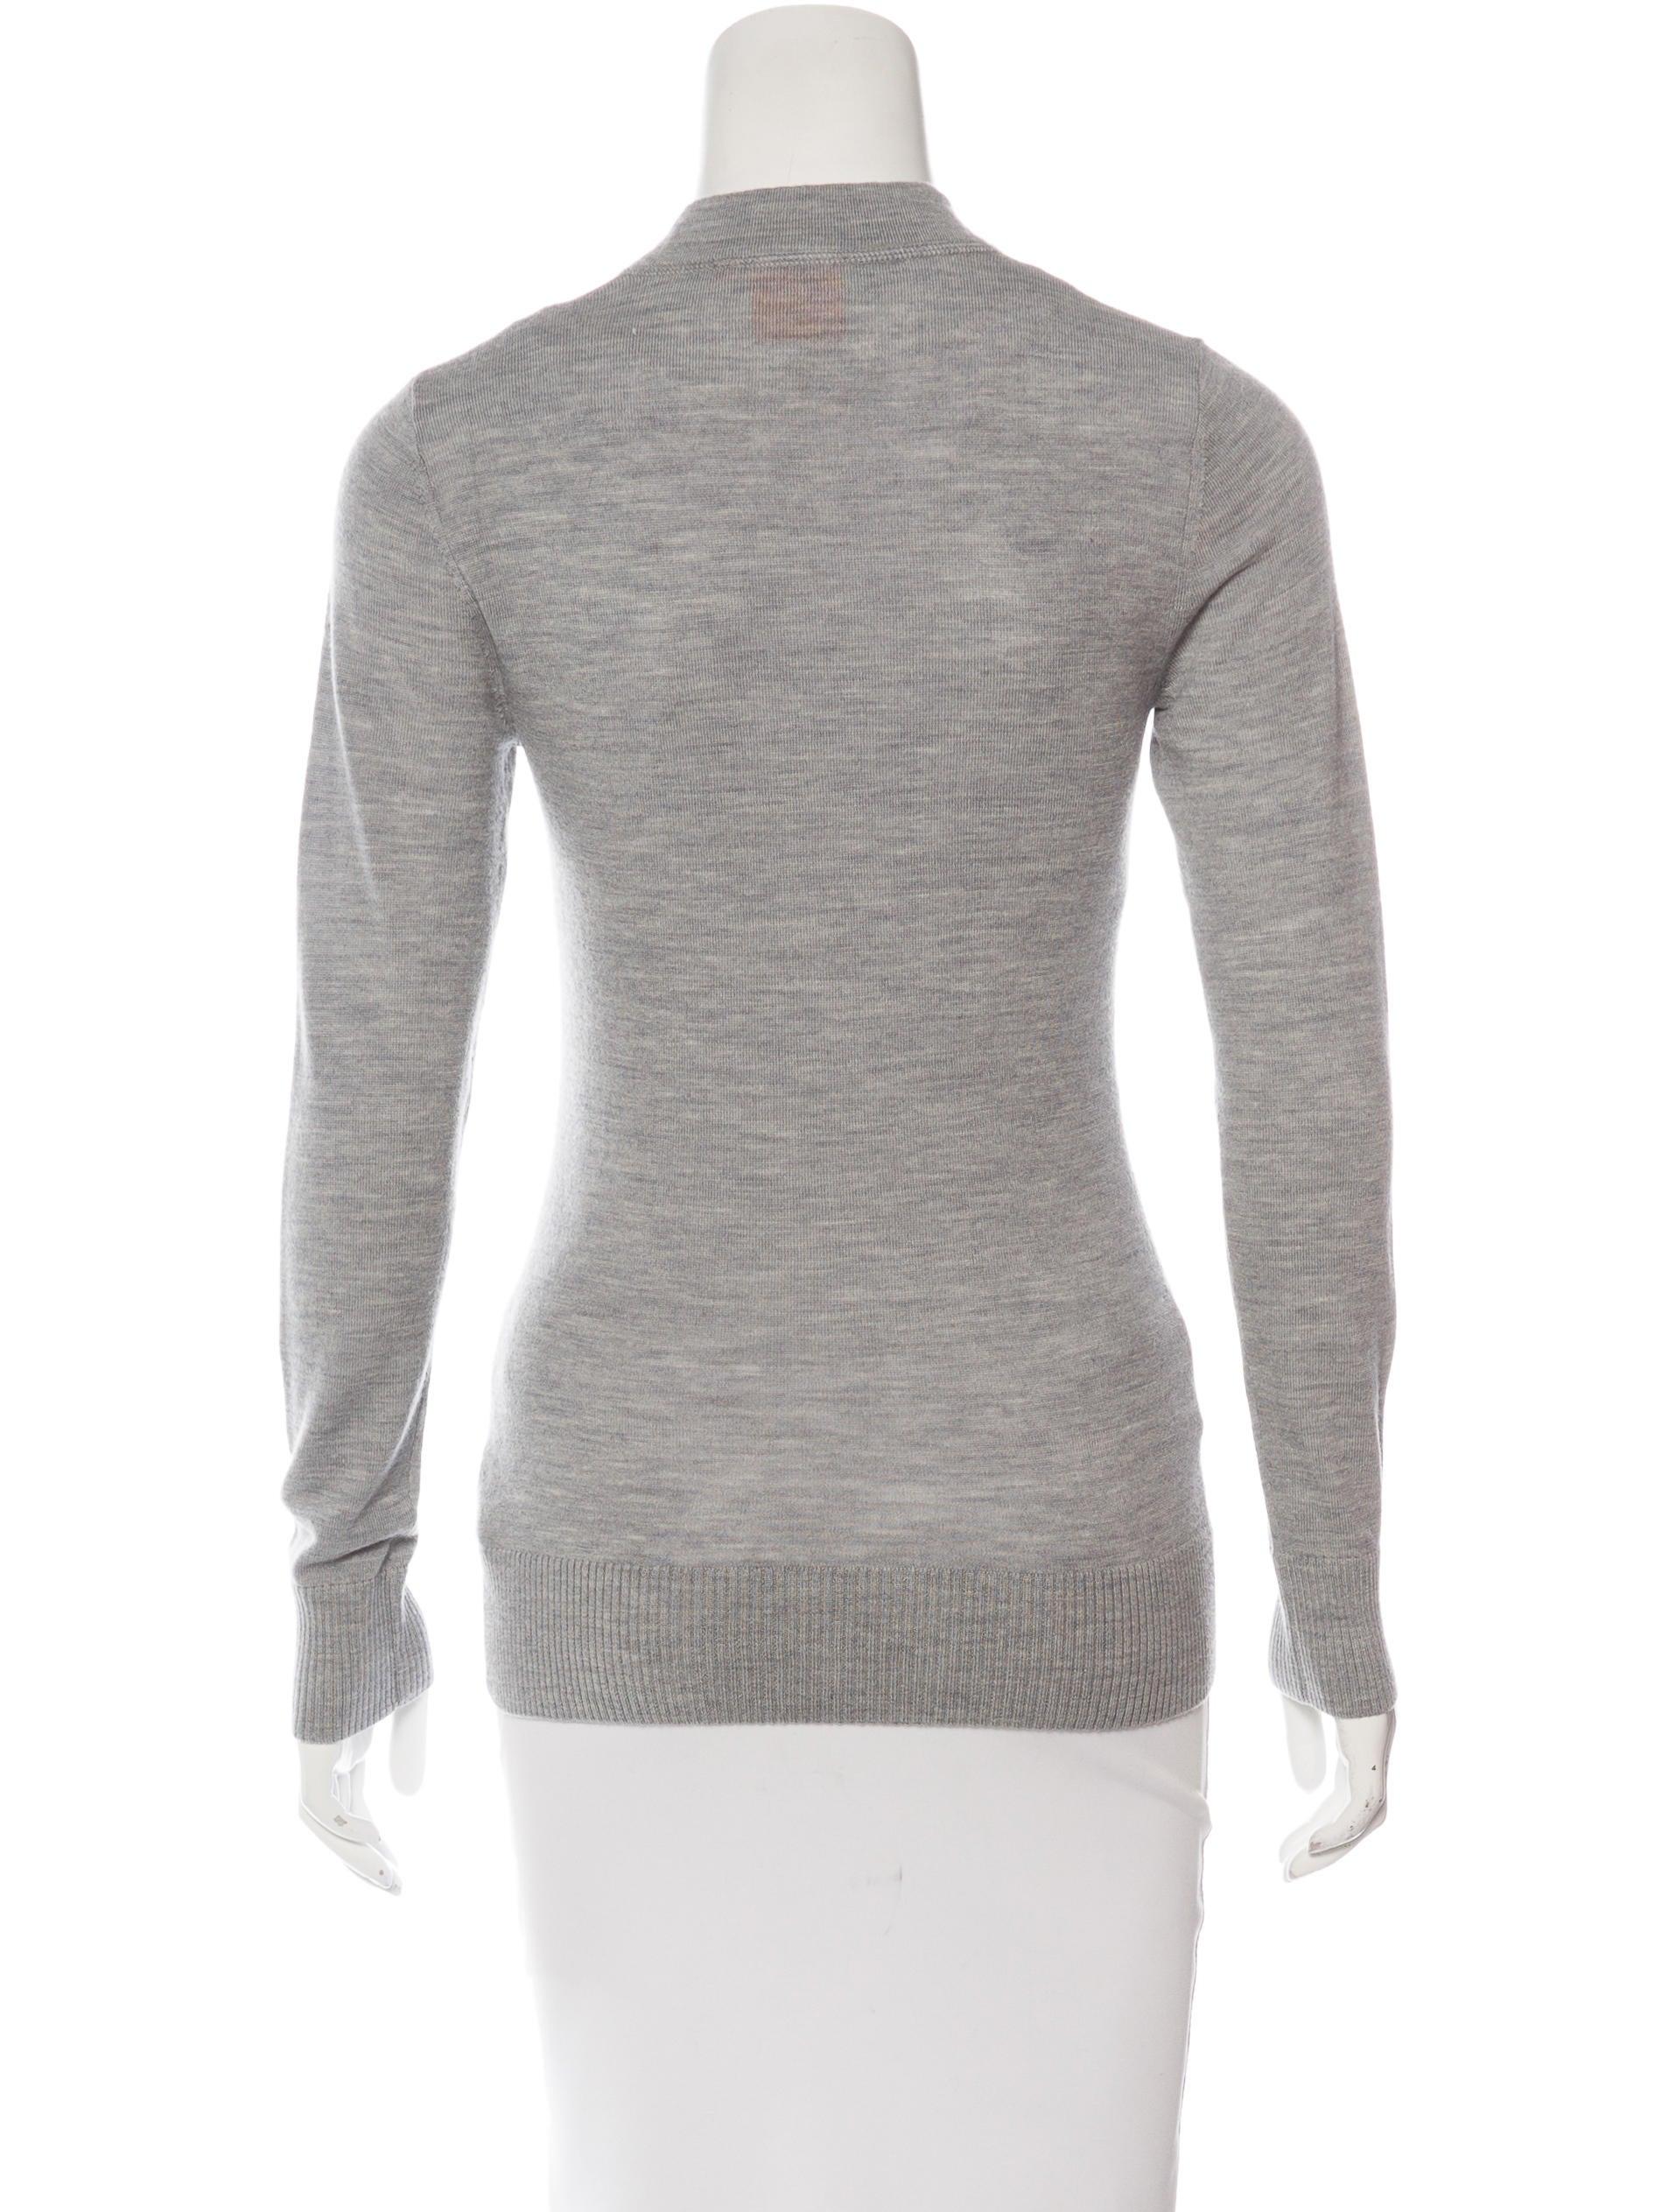 Tory burch merino wool long sleeve cardigan clothing for Merino wool shirt long sleeve